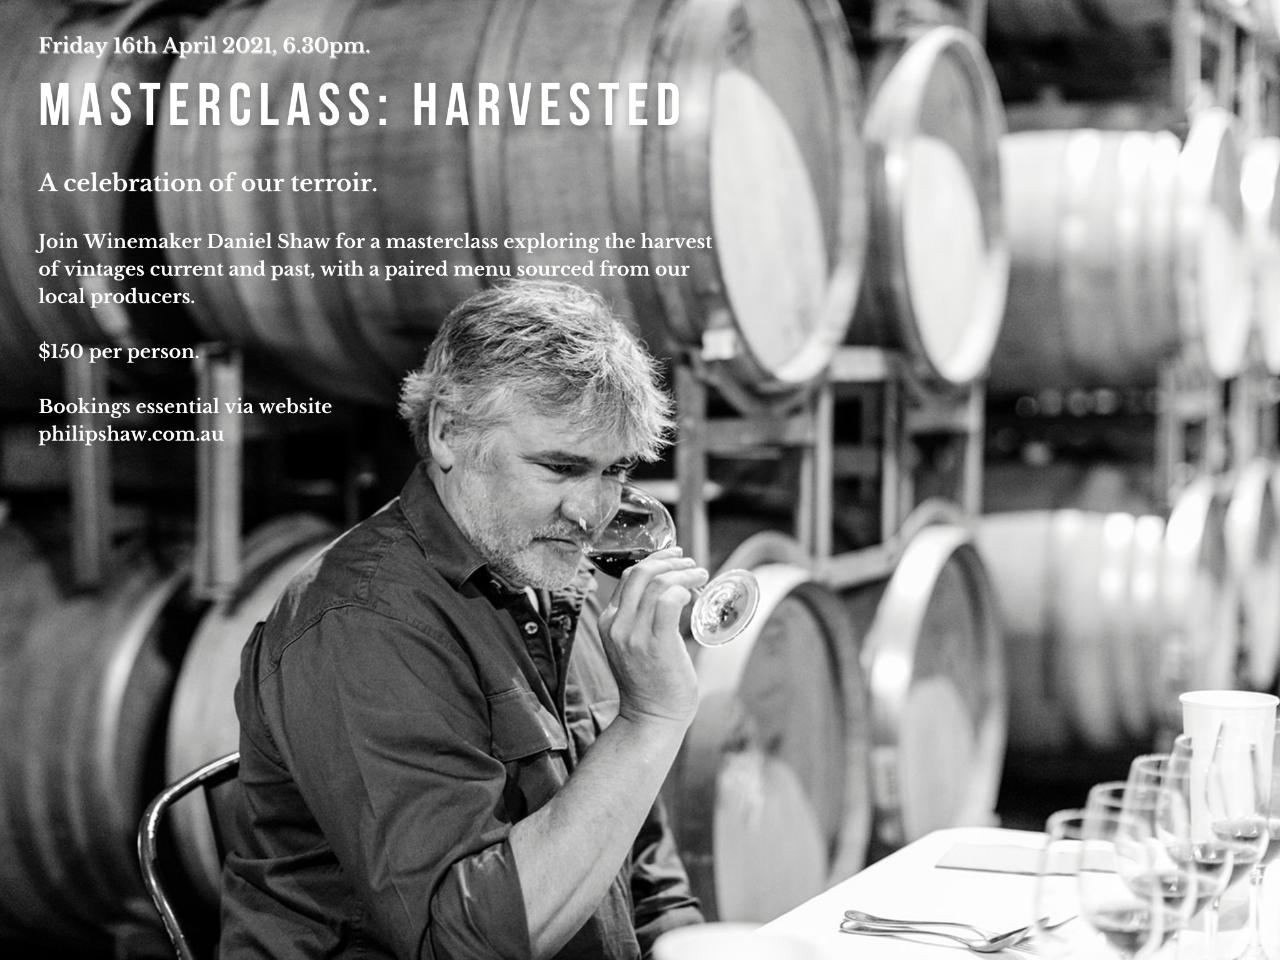 Masterclass: Harvested